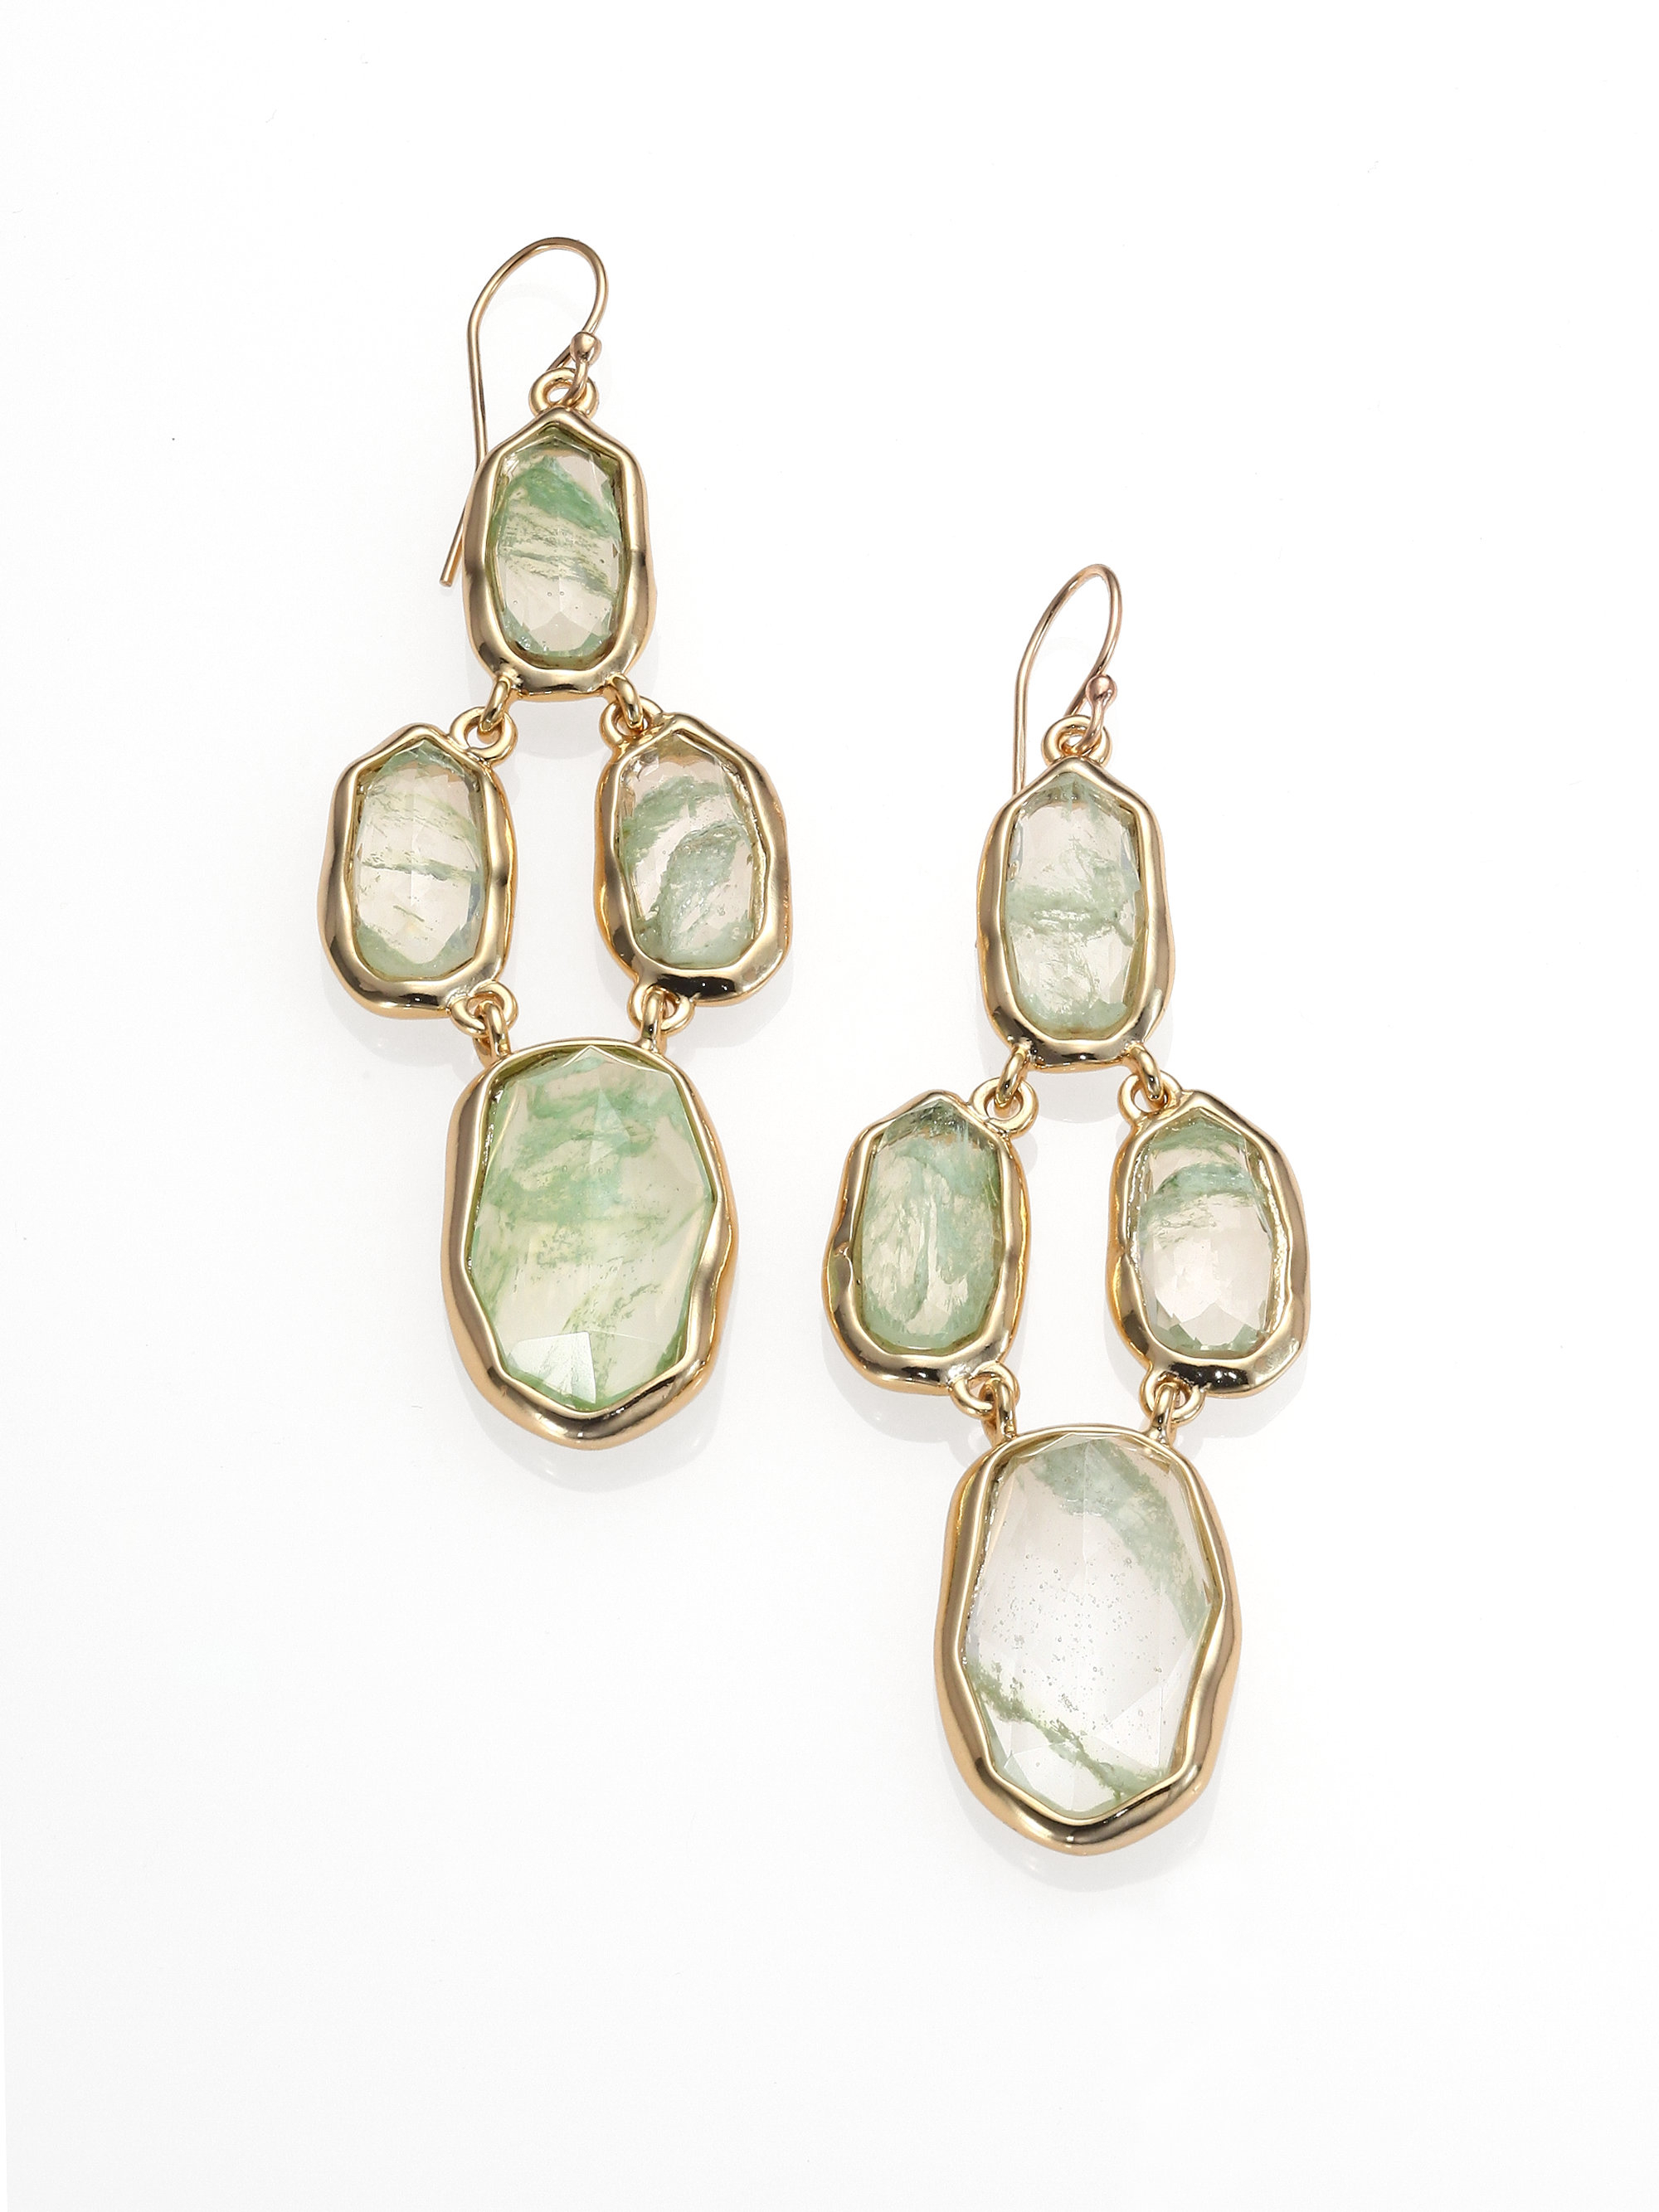 Alexis bittar Miss Havisham Liquid Crackle Glass Chandelier – Aqua Chandelier Earrings